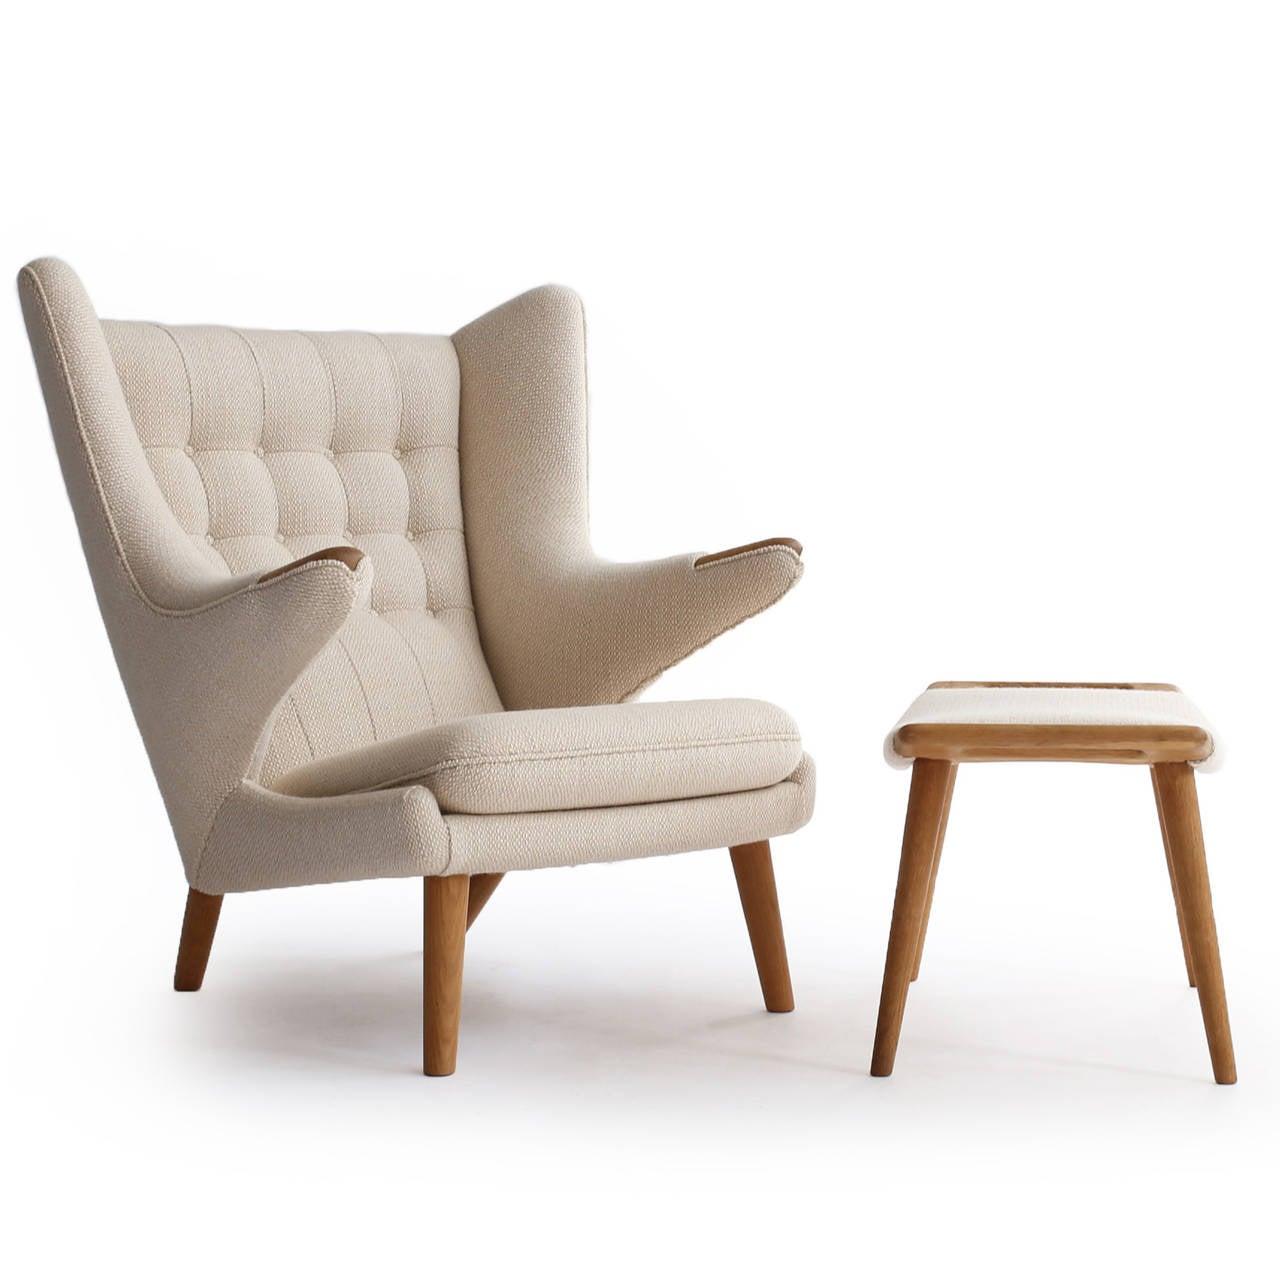 Astonishing Vintage Hans J Wegner Papa Bear Chair With Stool At 1Stdibs Ibusinesslaw Wood Chair Design Ideas Ibusinesslaworg